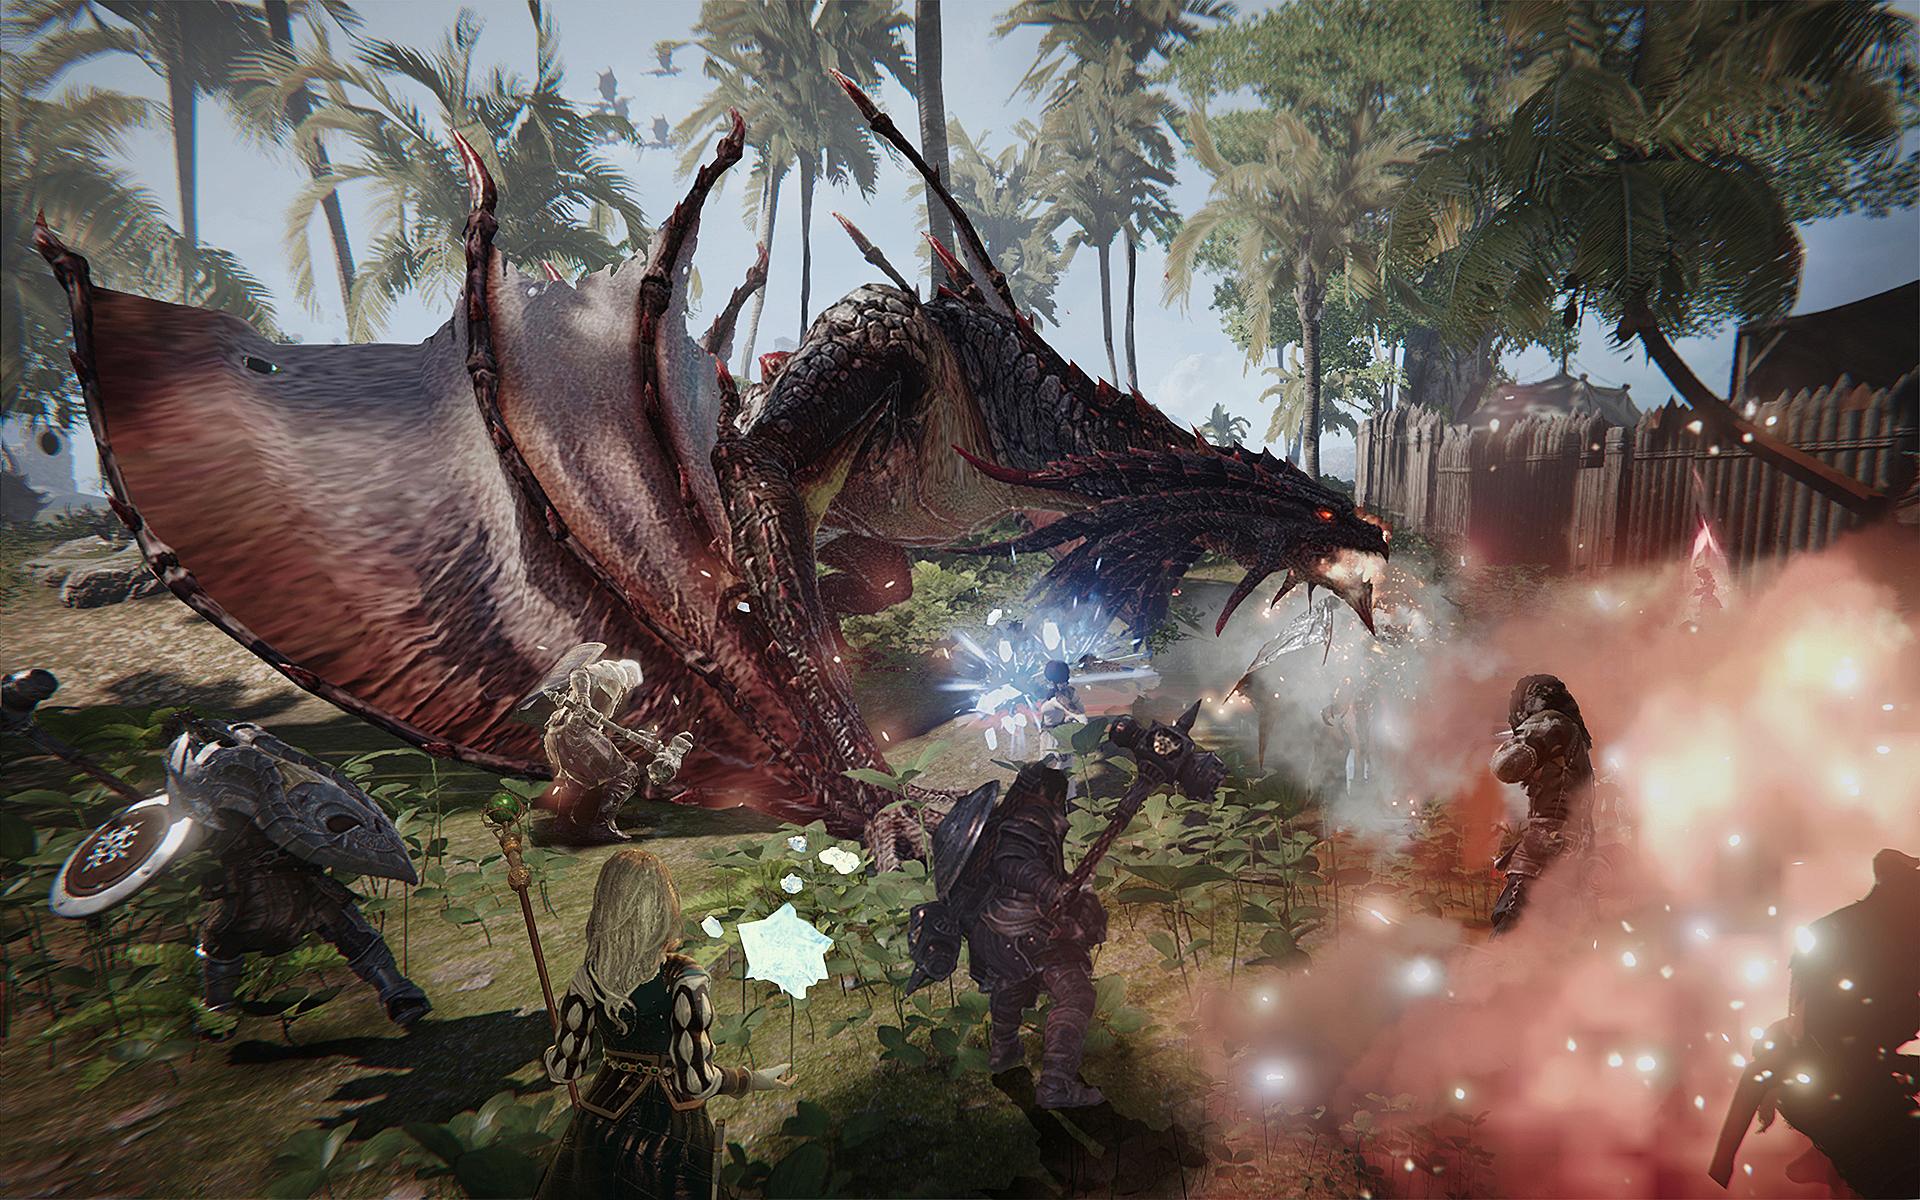 Ascent Infinite Realm: Pubg-Macher stellt luftiges Rollenspiel vor - Ascent Infinite Realm (Air) (Bild: Kakao Games)